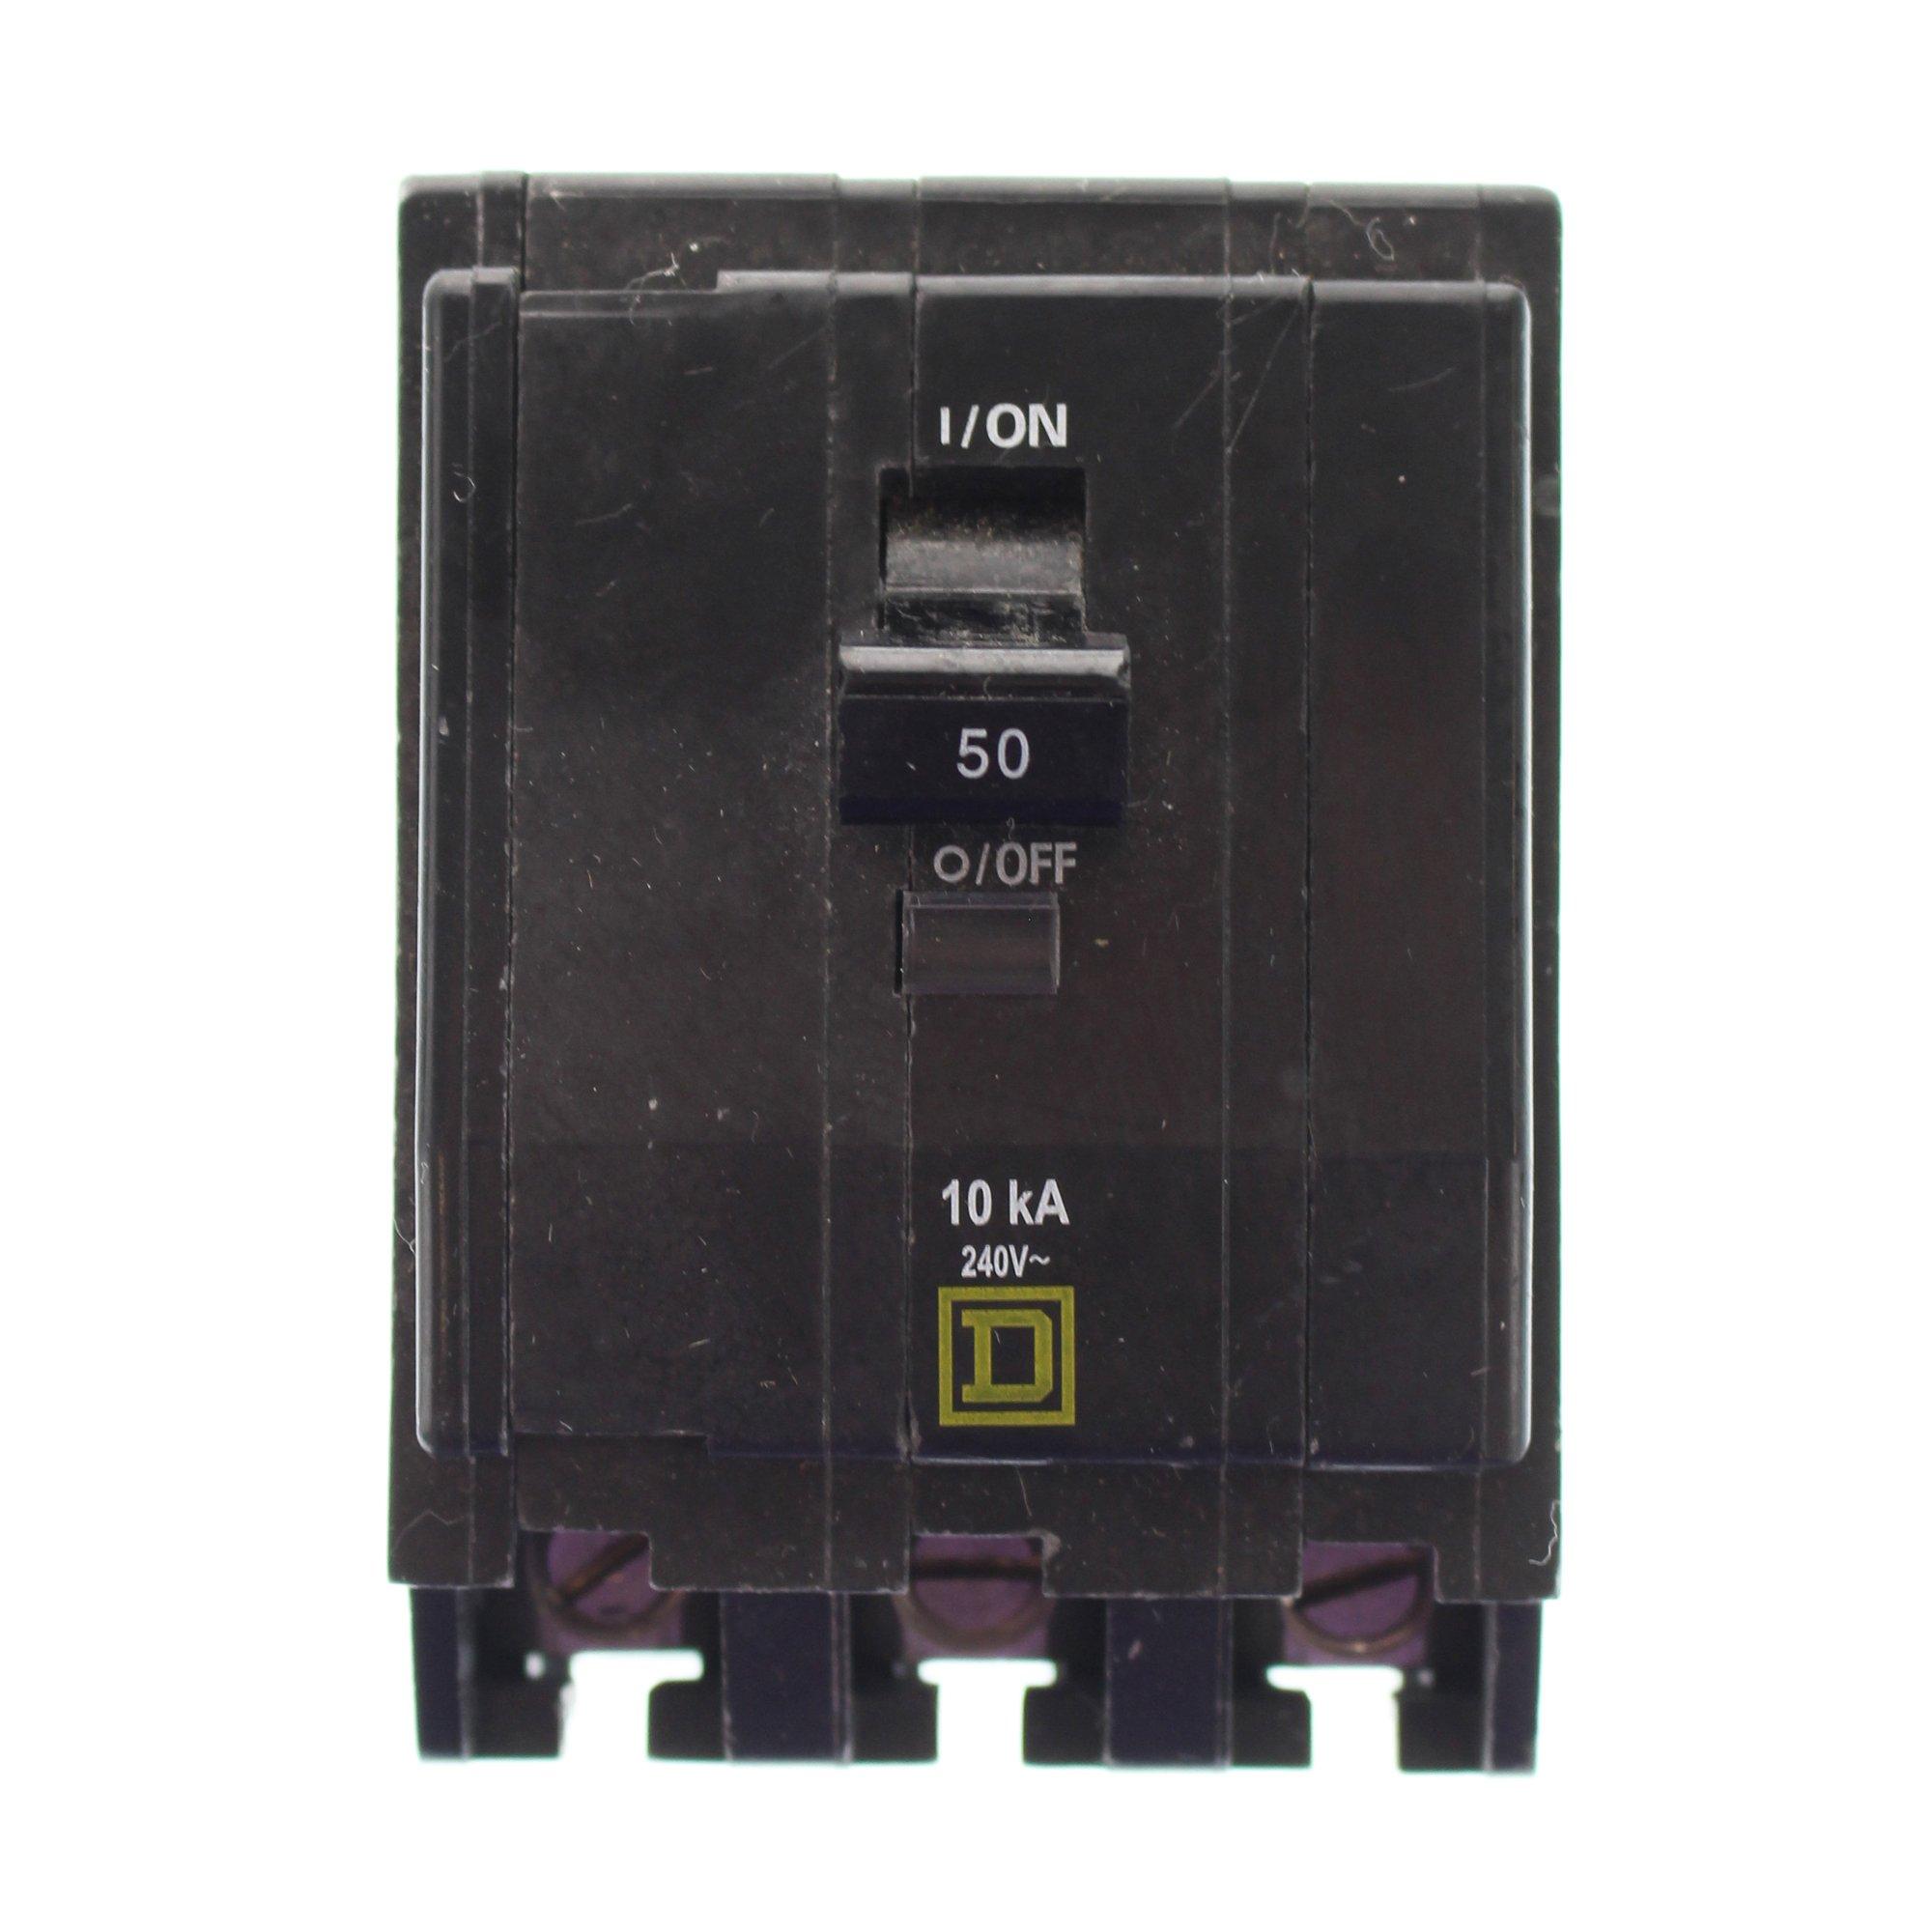 Square D QOB350 Miniature Circuit Breaker 50 Amp, 240 Volt AC, 48 Volt DC, 3-Pole, Bolt-On Mount